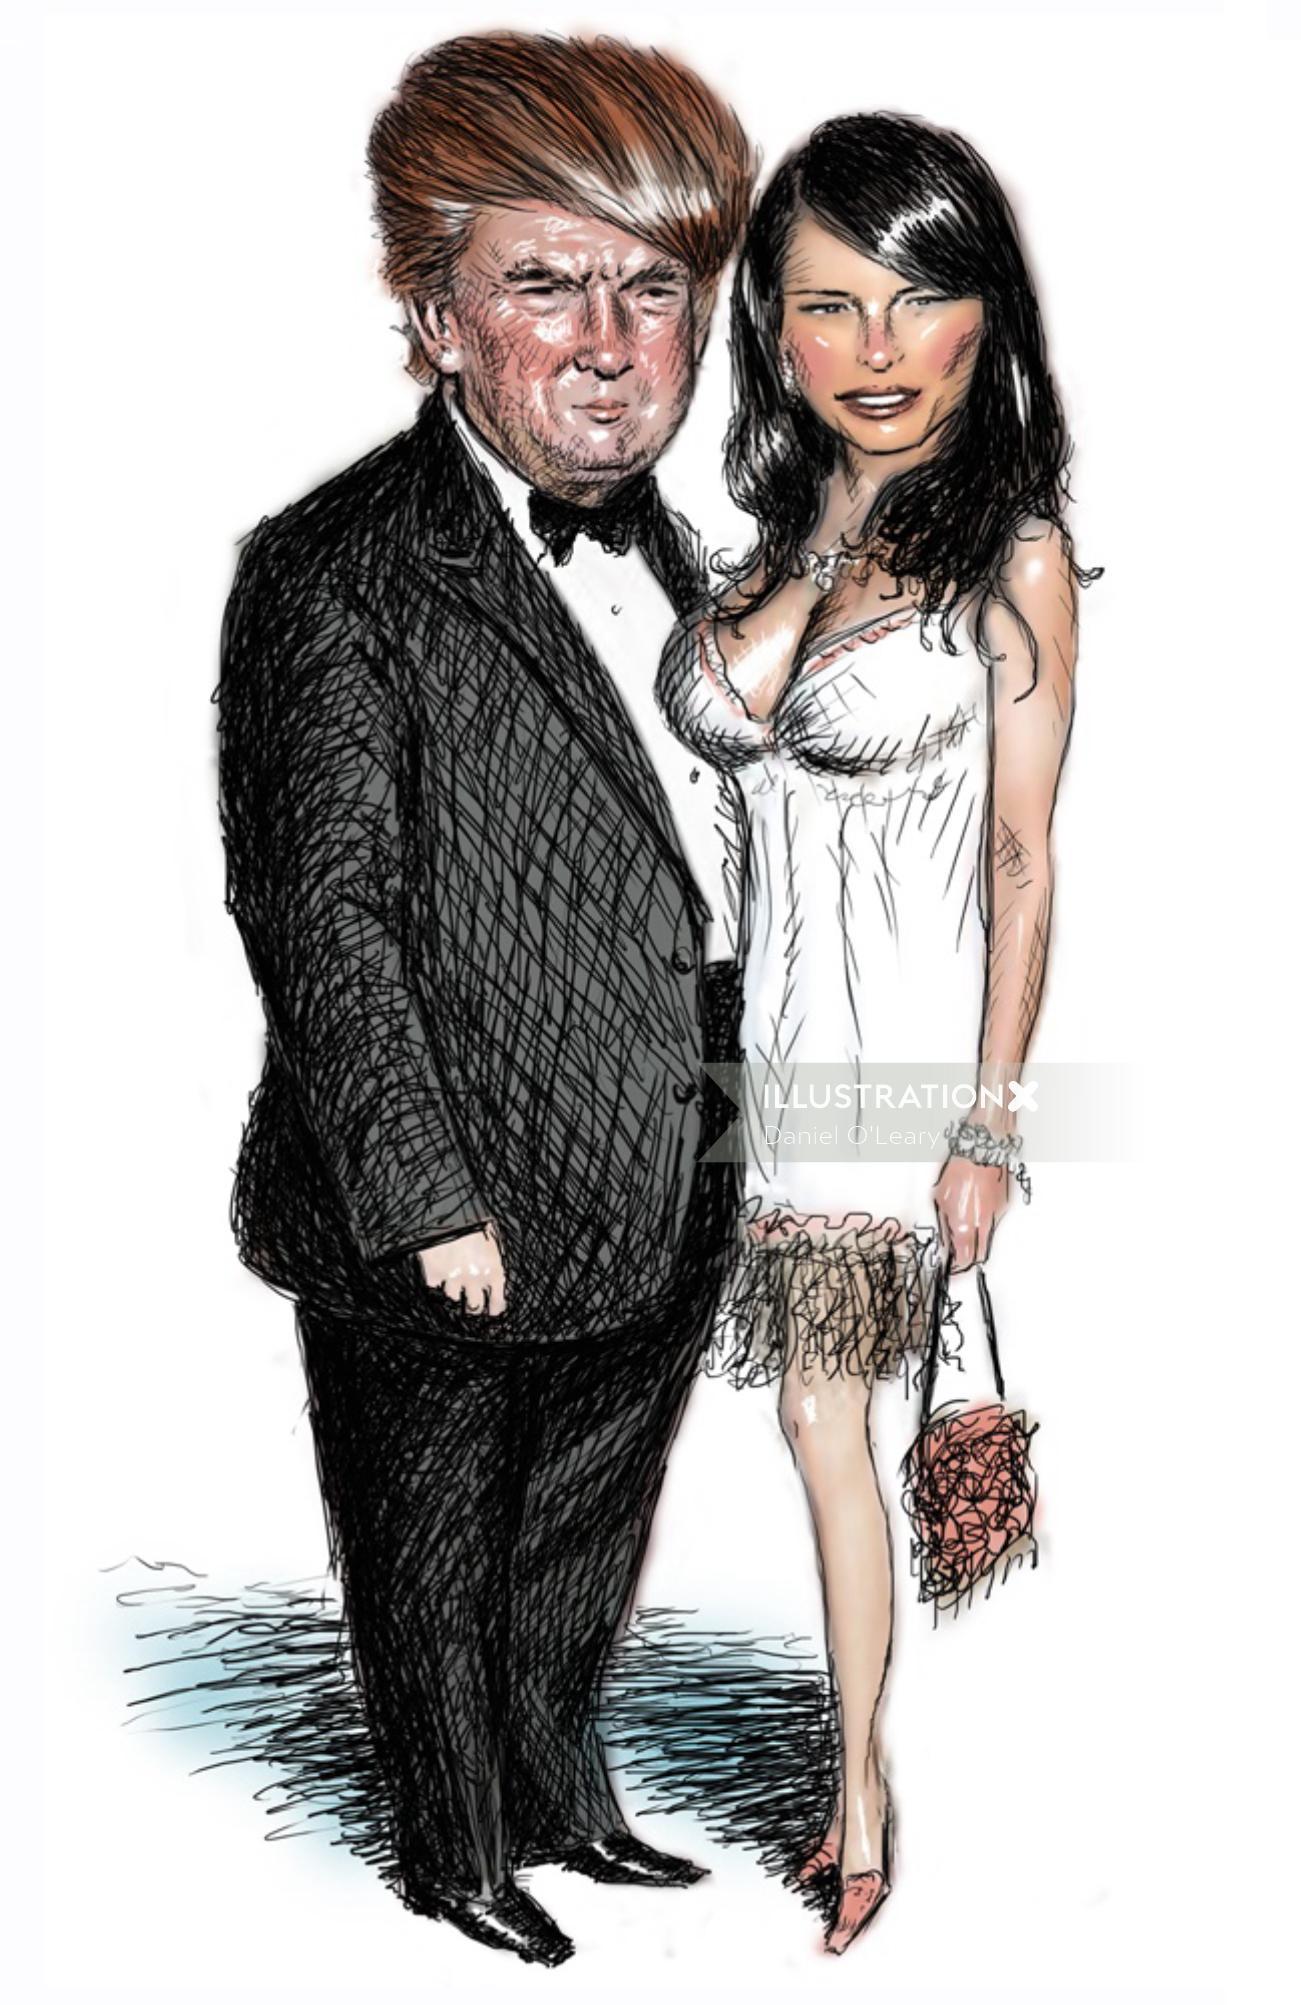 Trump, Melania, US President cartoon and humour